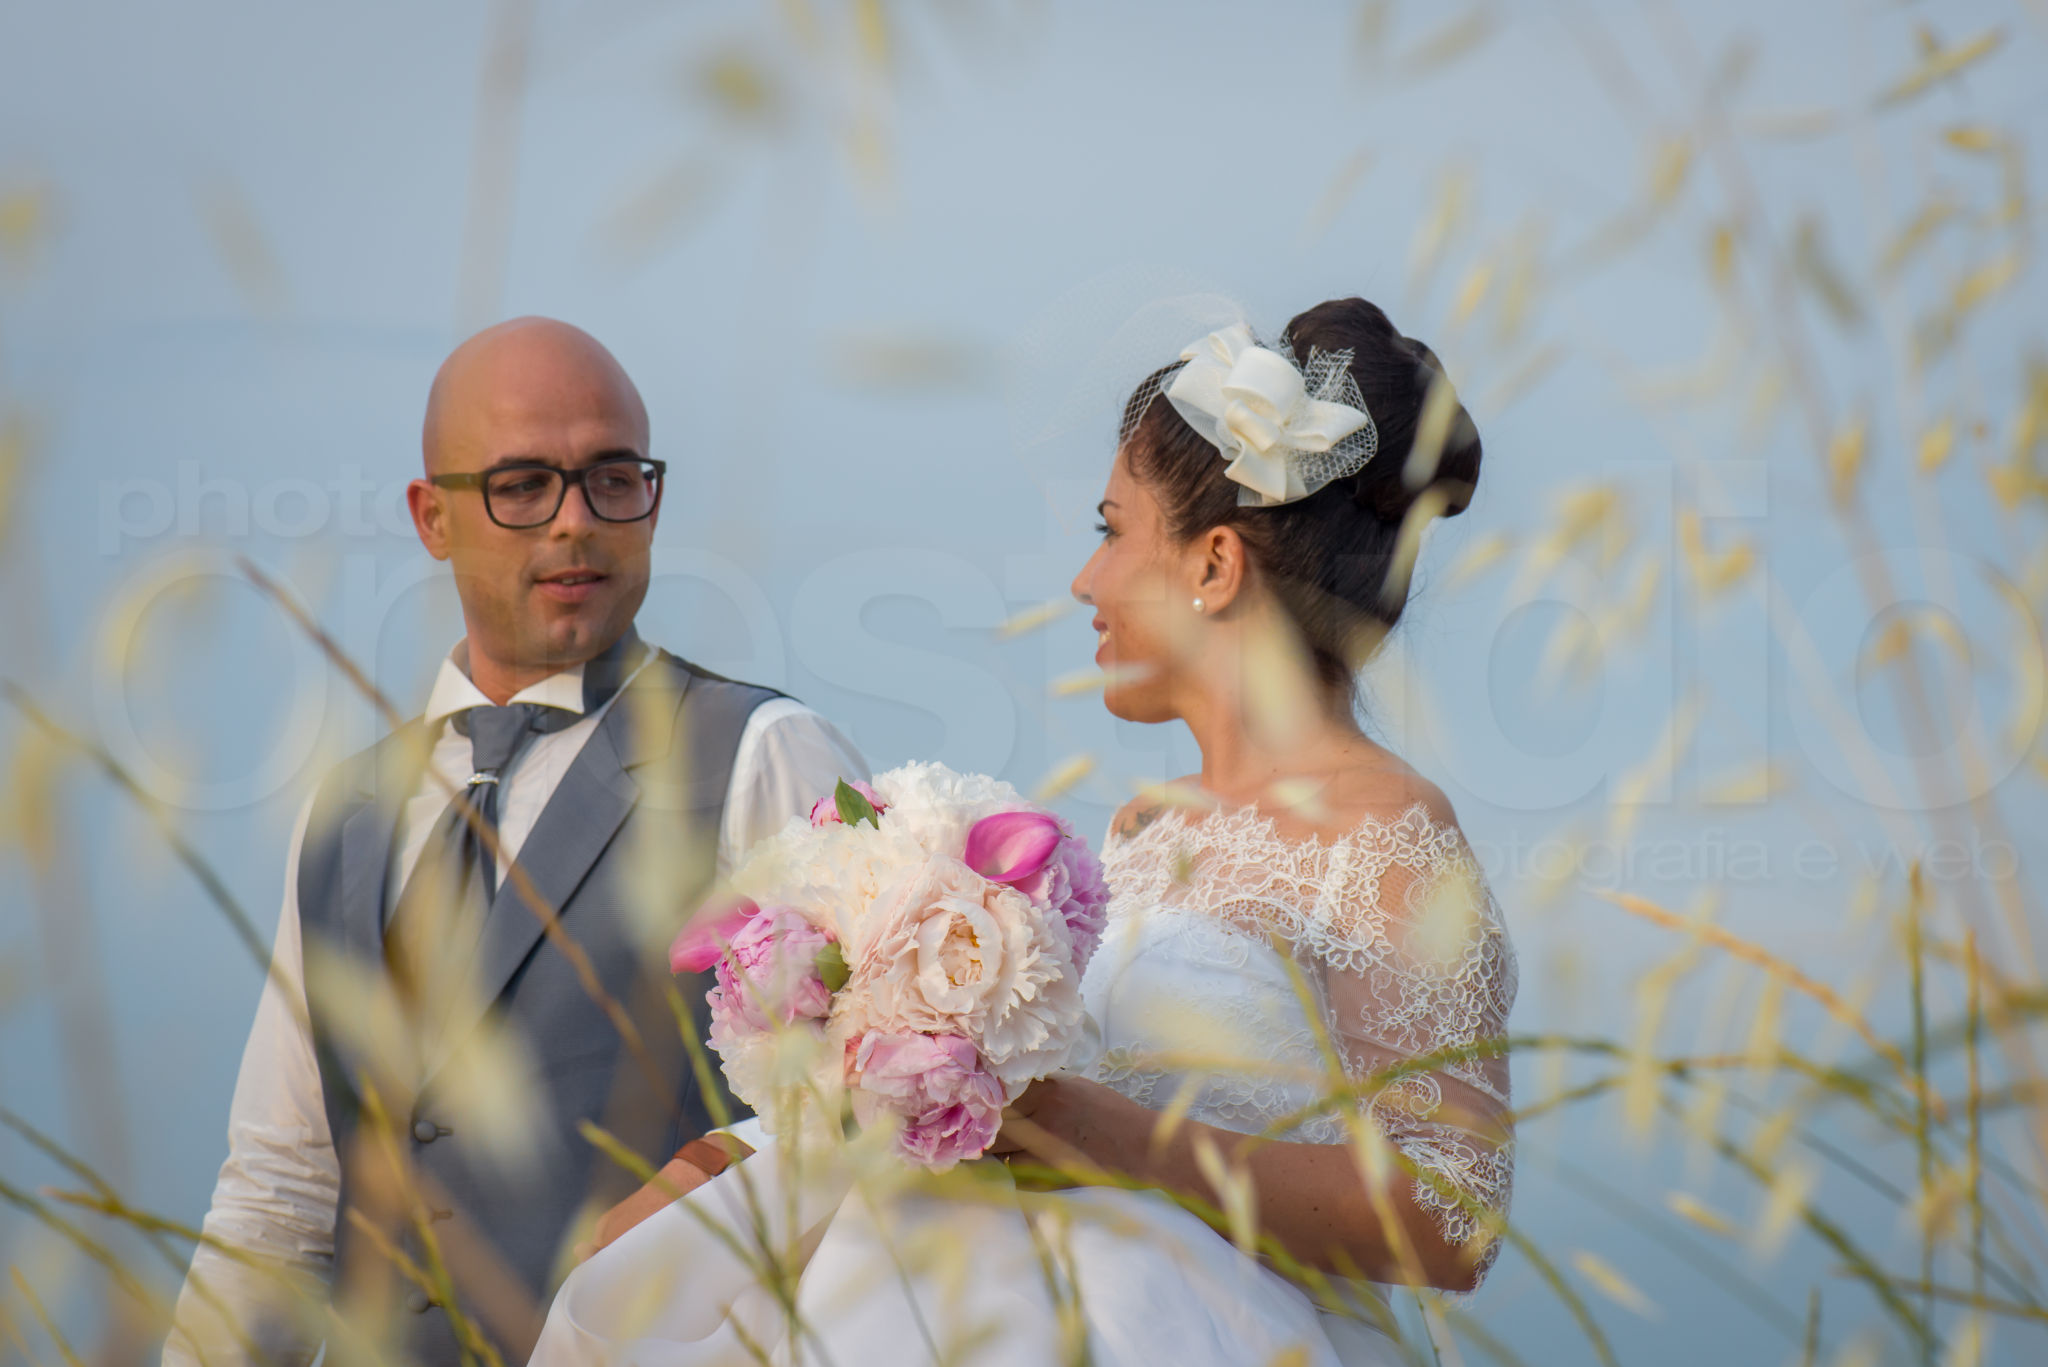 http://lnx.mirkone.it/wp-content/uploads/2015/07/fotografo-matrimoni-faenza-0007.jpg